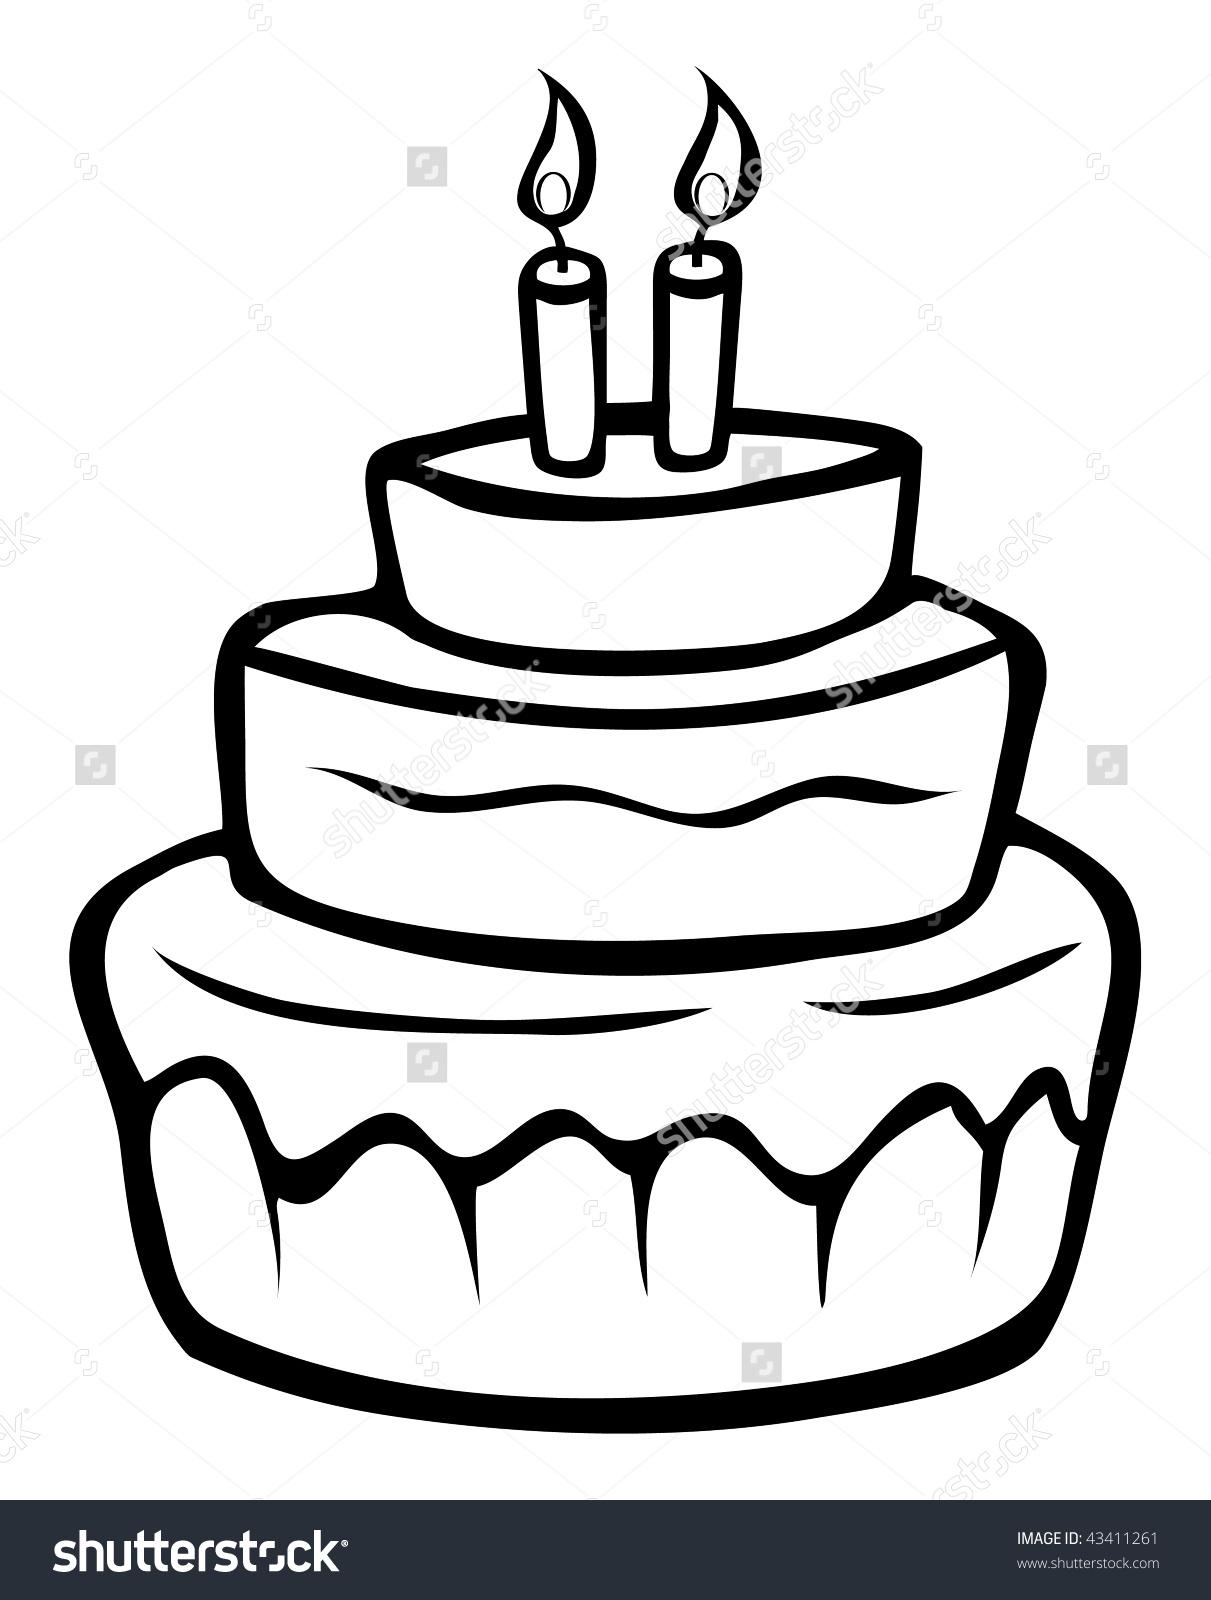 1211x1600 Cartoon Cake Drawing